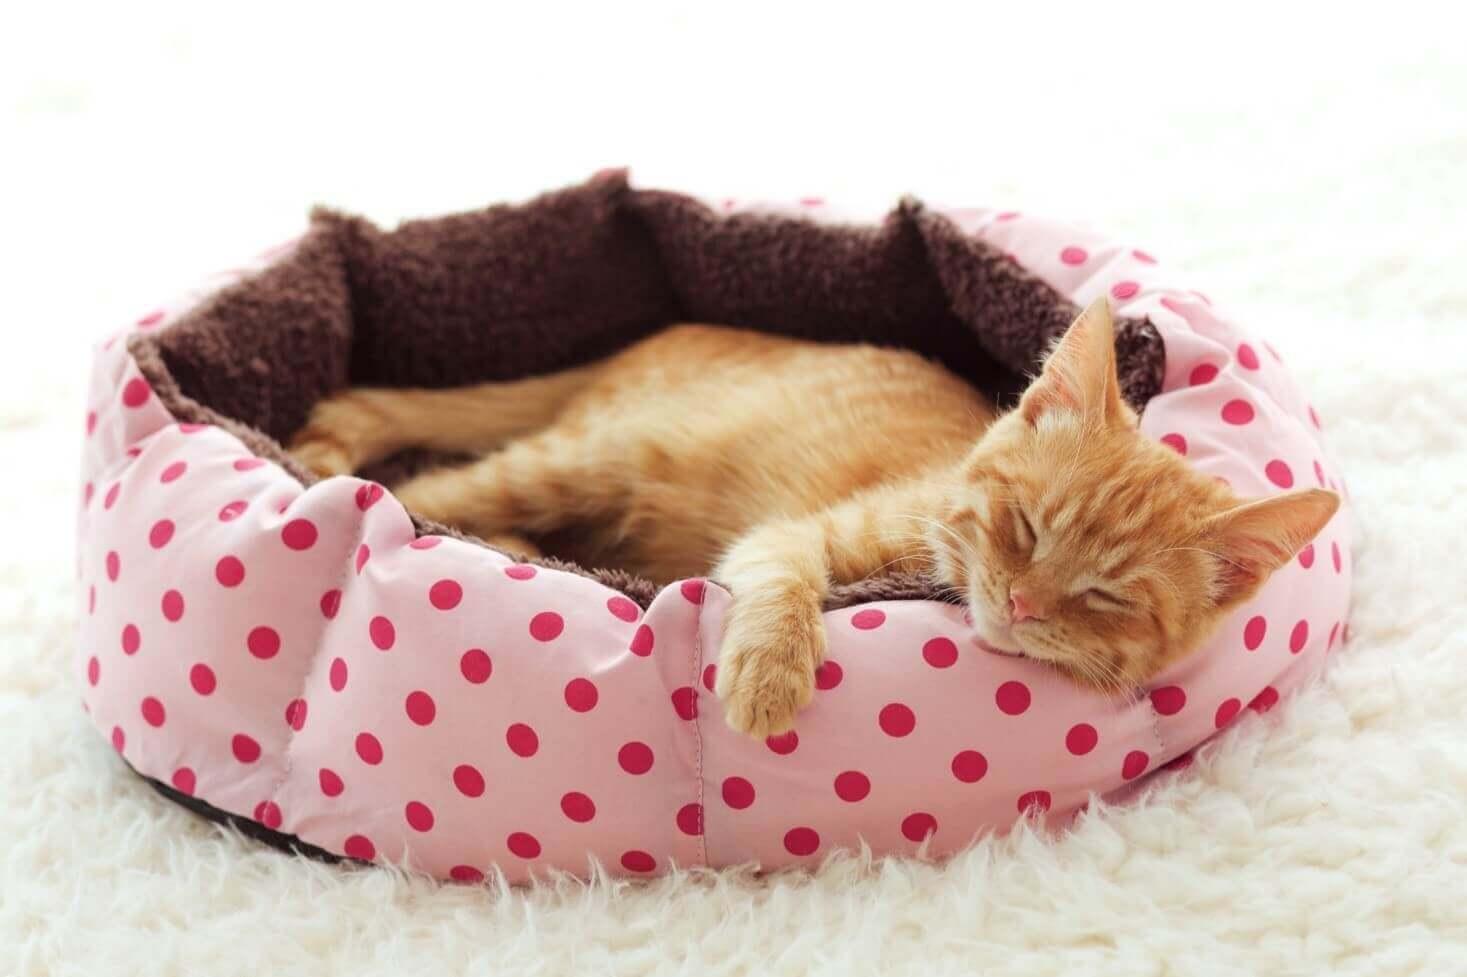 Katze schläft in Katzenkorb